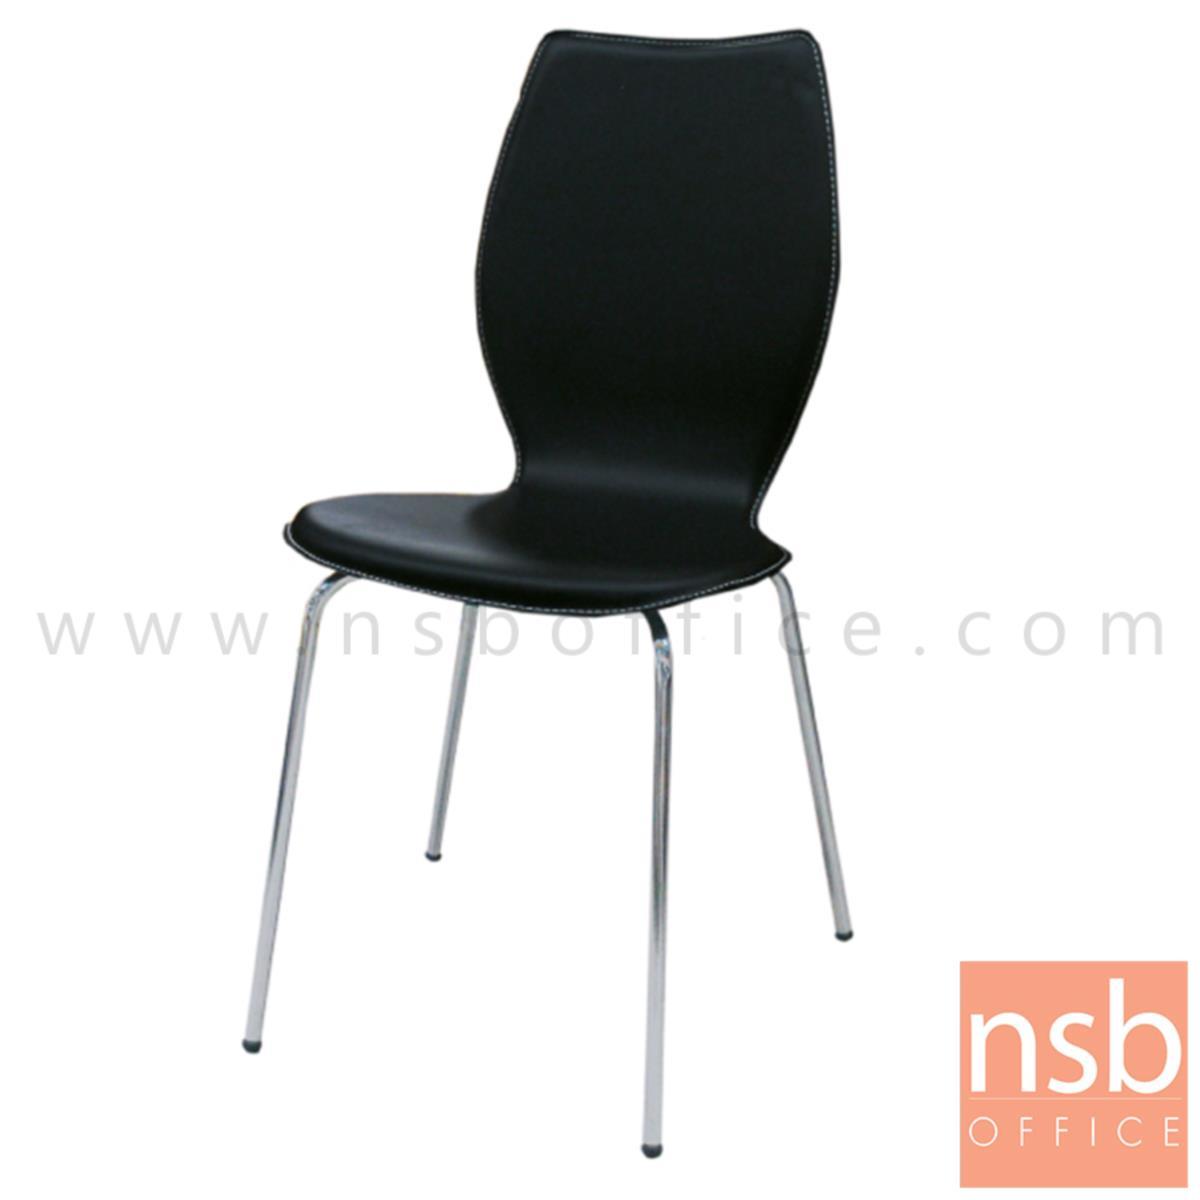 B20A058:เก้าอี้อเนกประสงค์ไม้วีเนียร์ดัด รุ่น Gorgonzola (กอร์กอนโซล่า)  ขาเหล็กชุบโครเมี่ยม